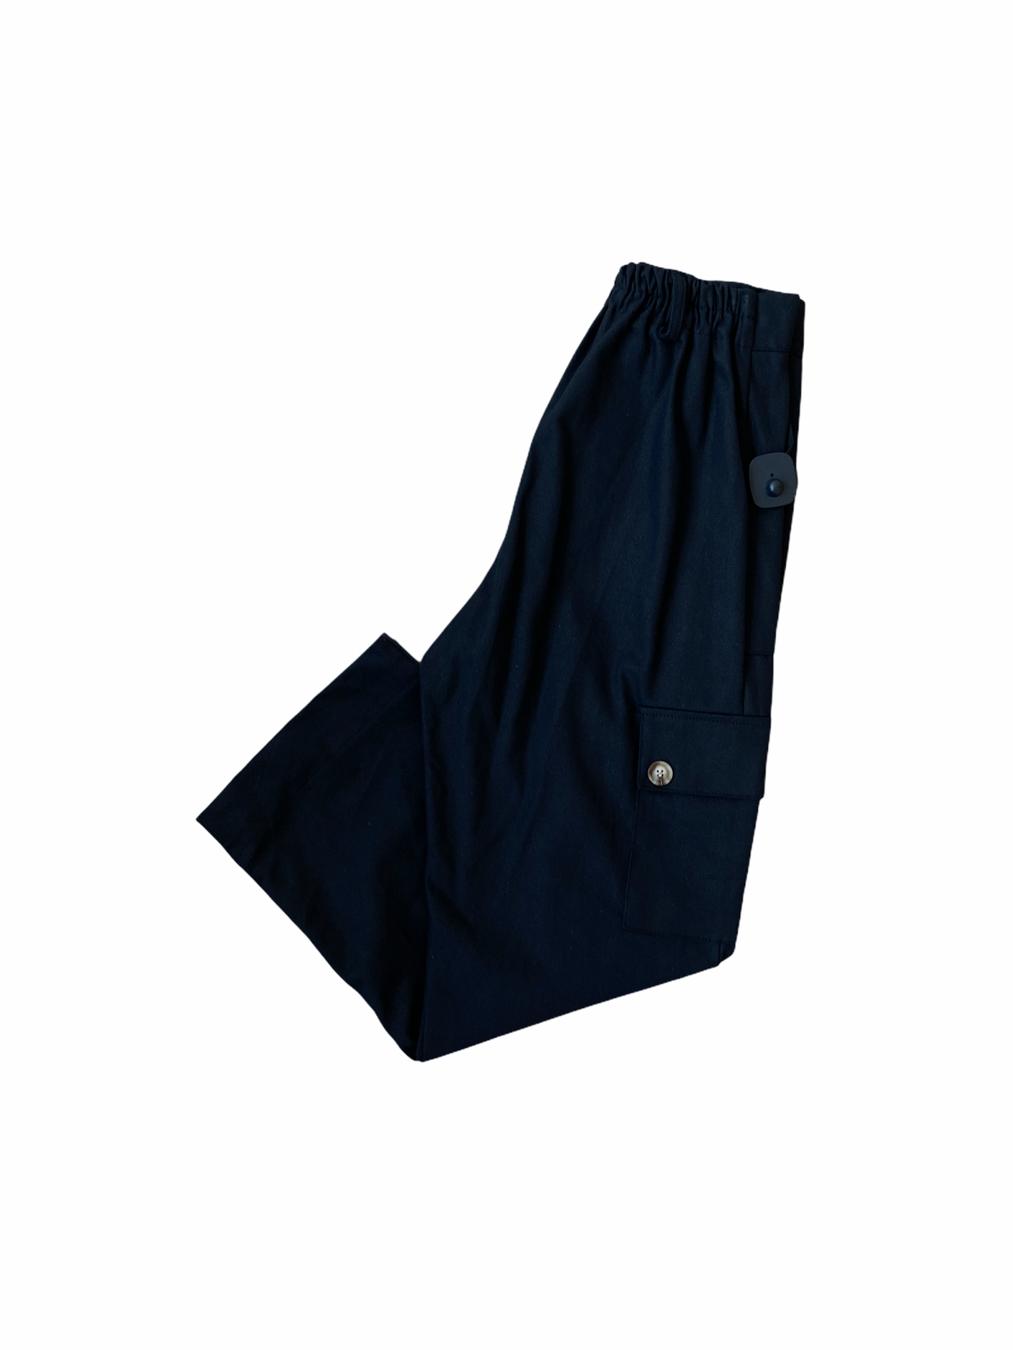 Cham Him Cargo Pants (Black)